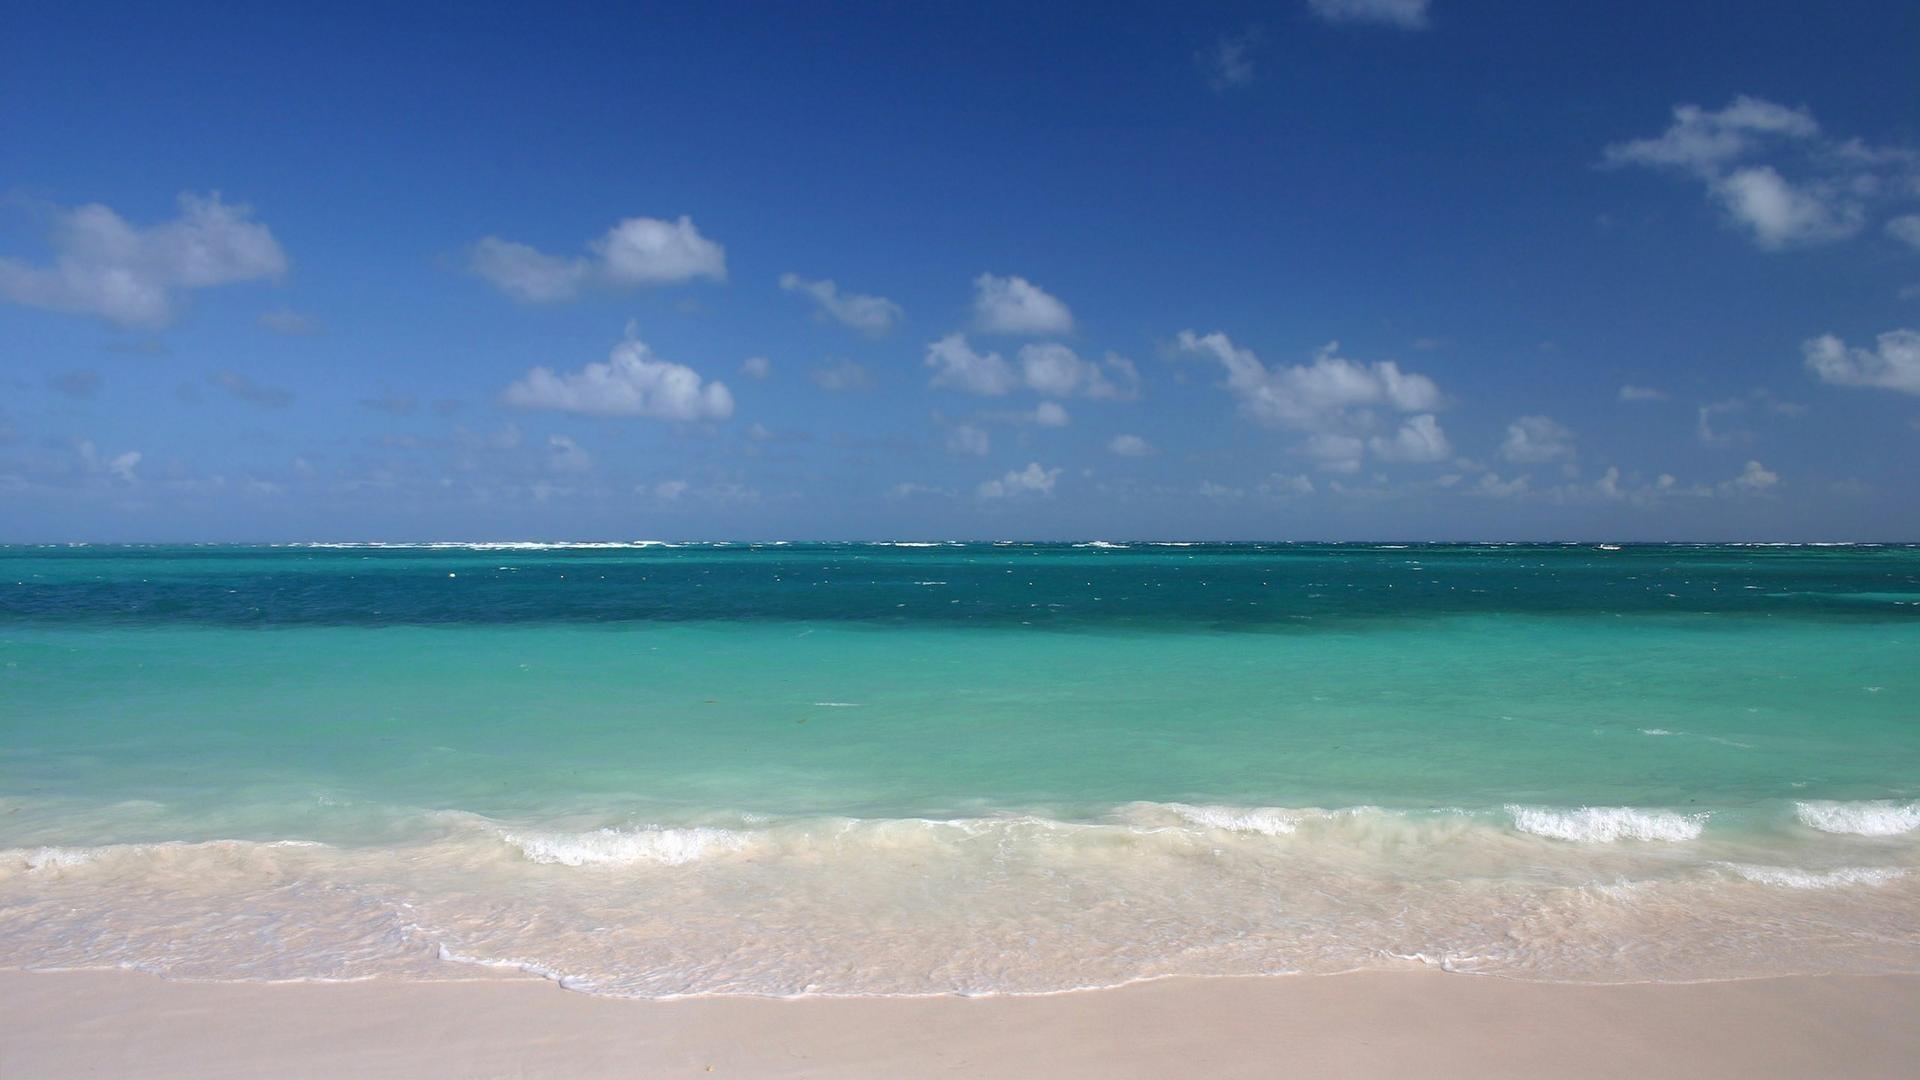 Beach Scenes wallpaper – 794748